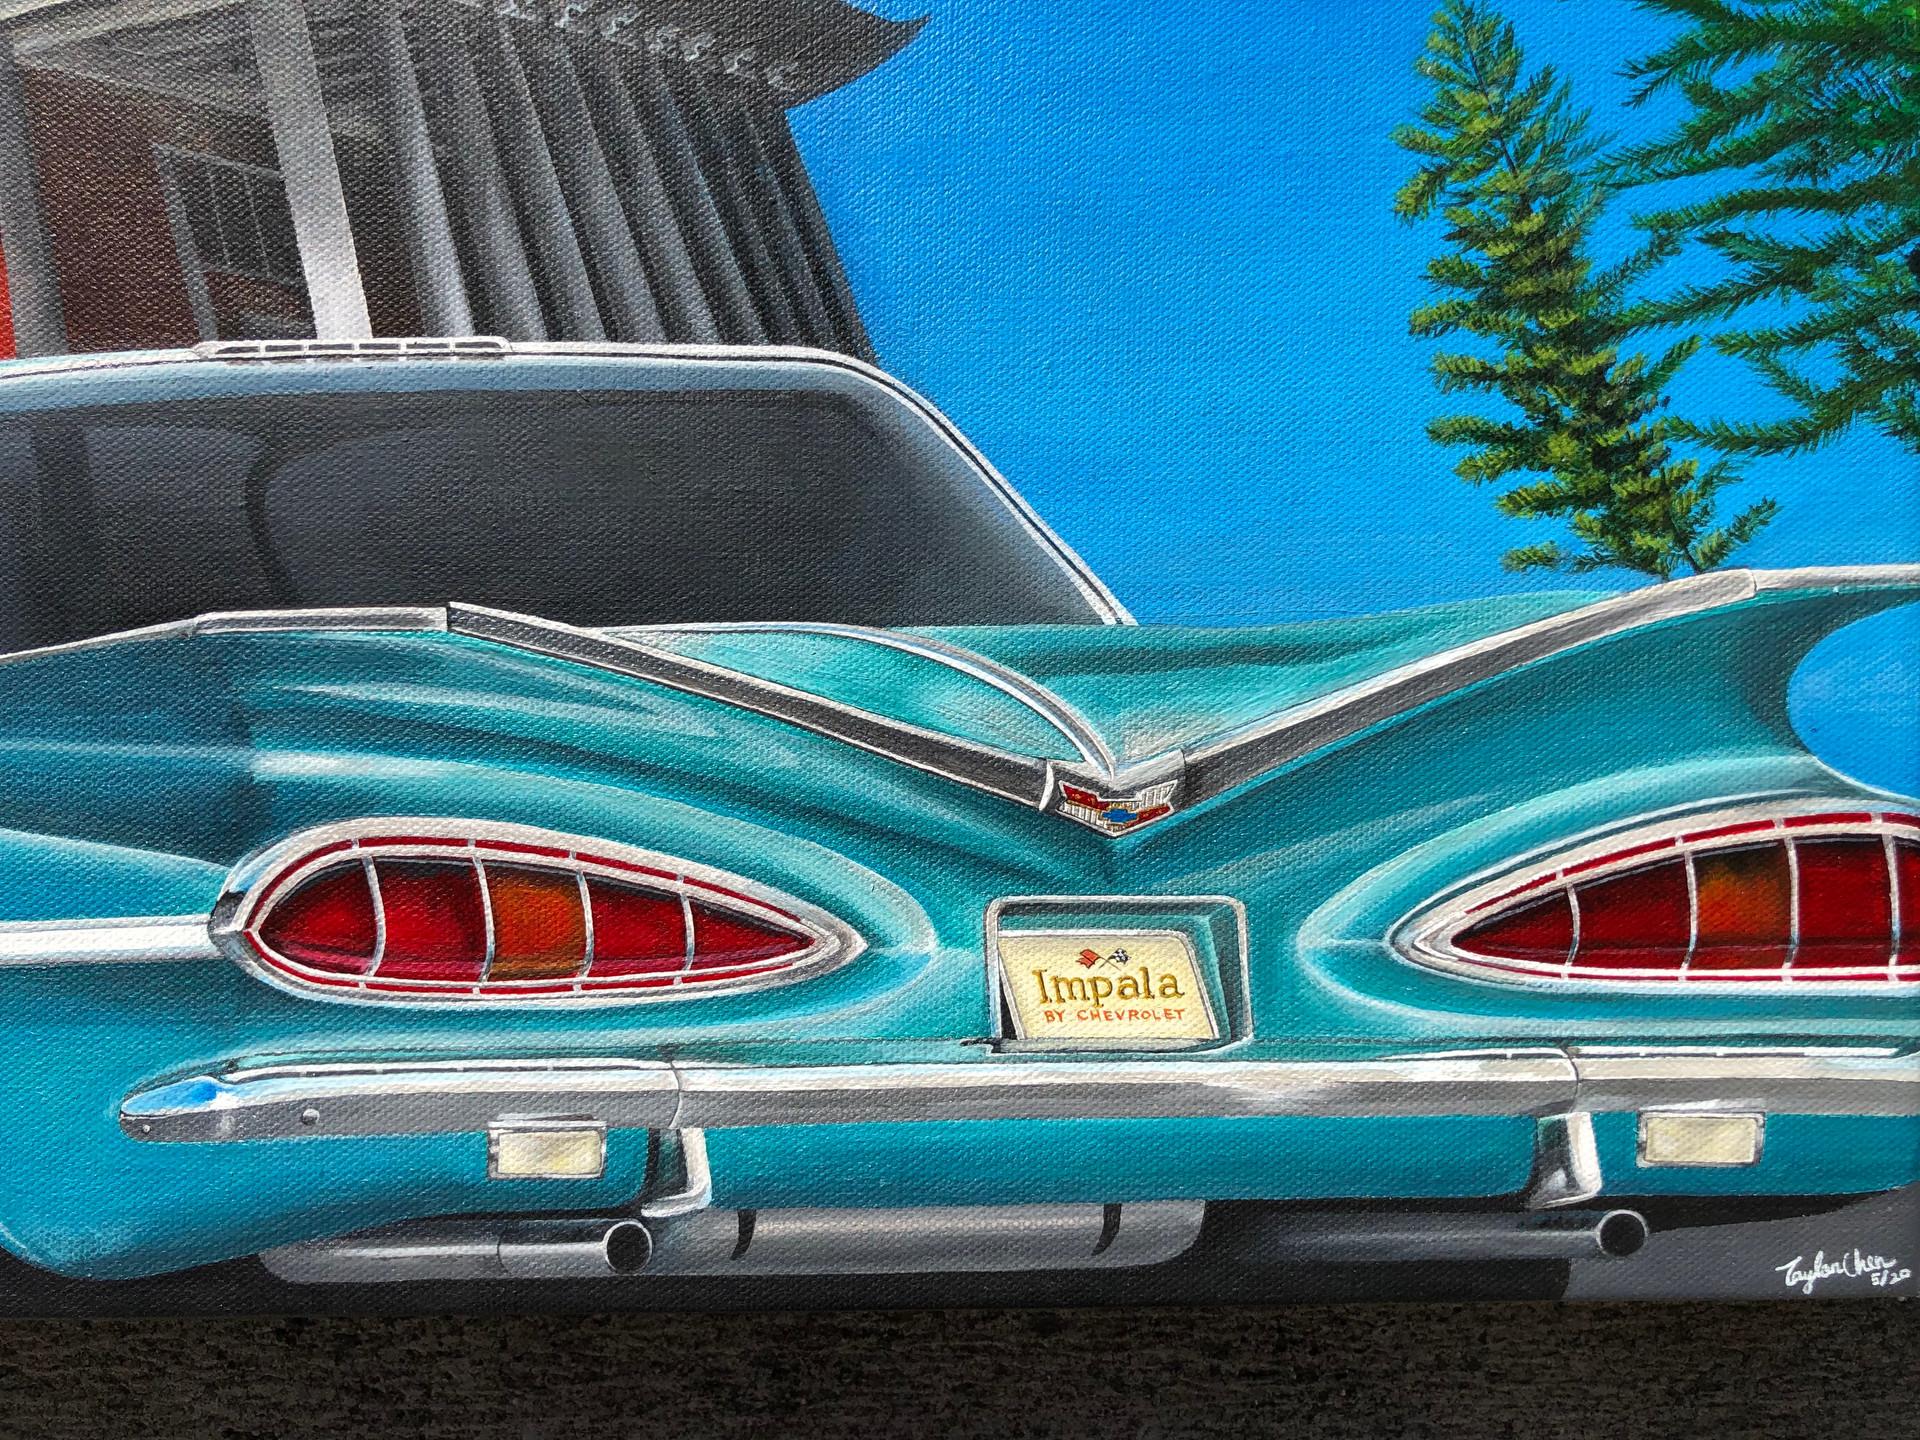 12x36 Acrylic on canvas 1959 Chevy Impala